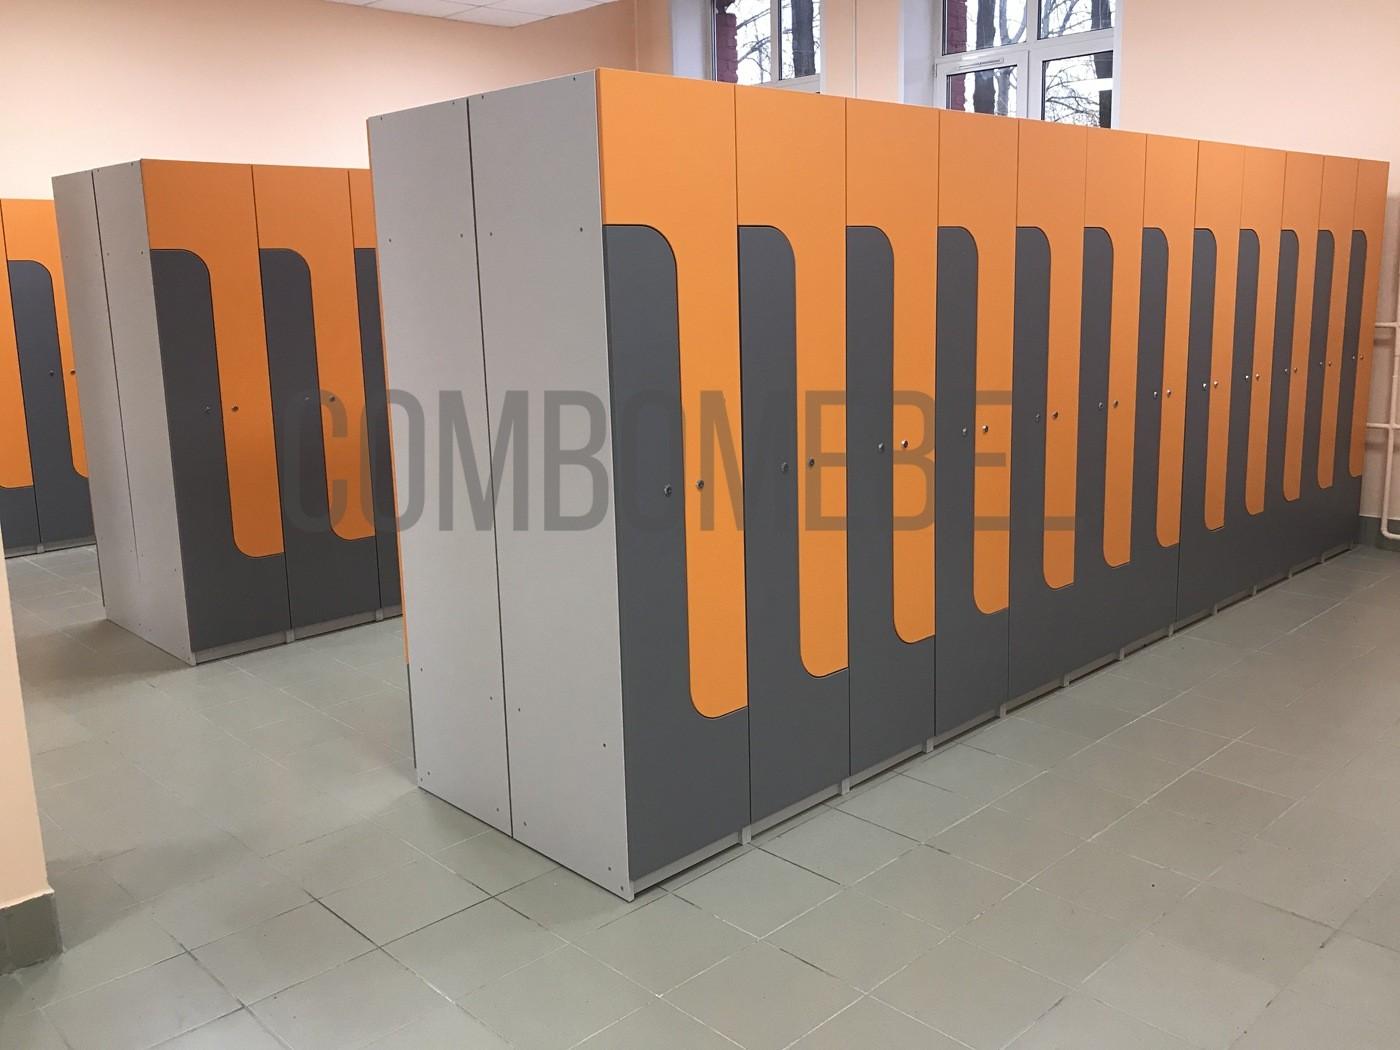 шкафы для школы в Москве по типовому проекту на заказ из ЛДСП Egger